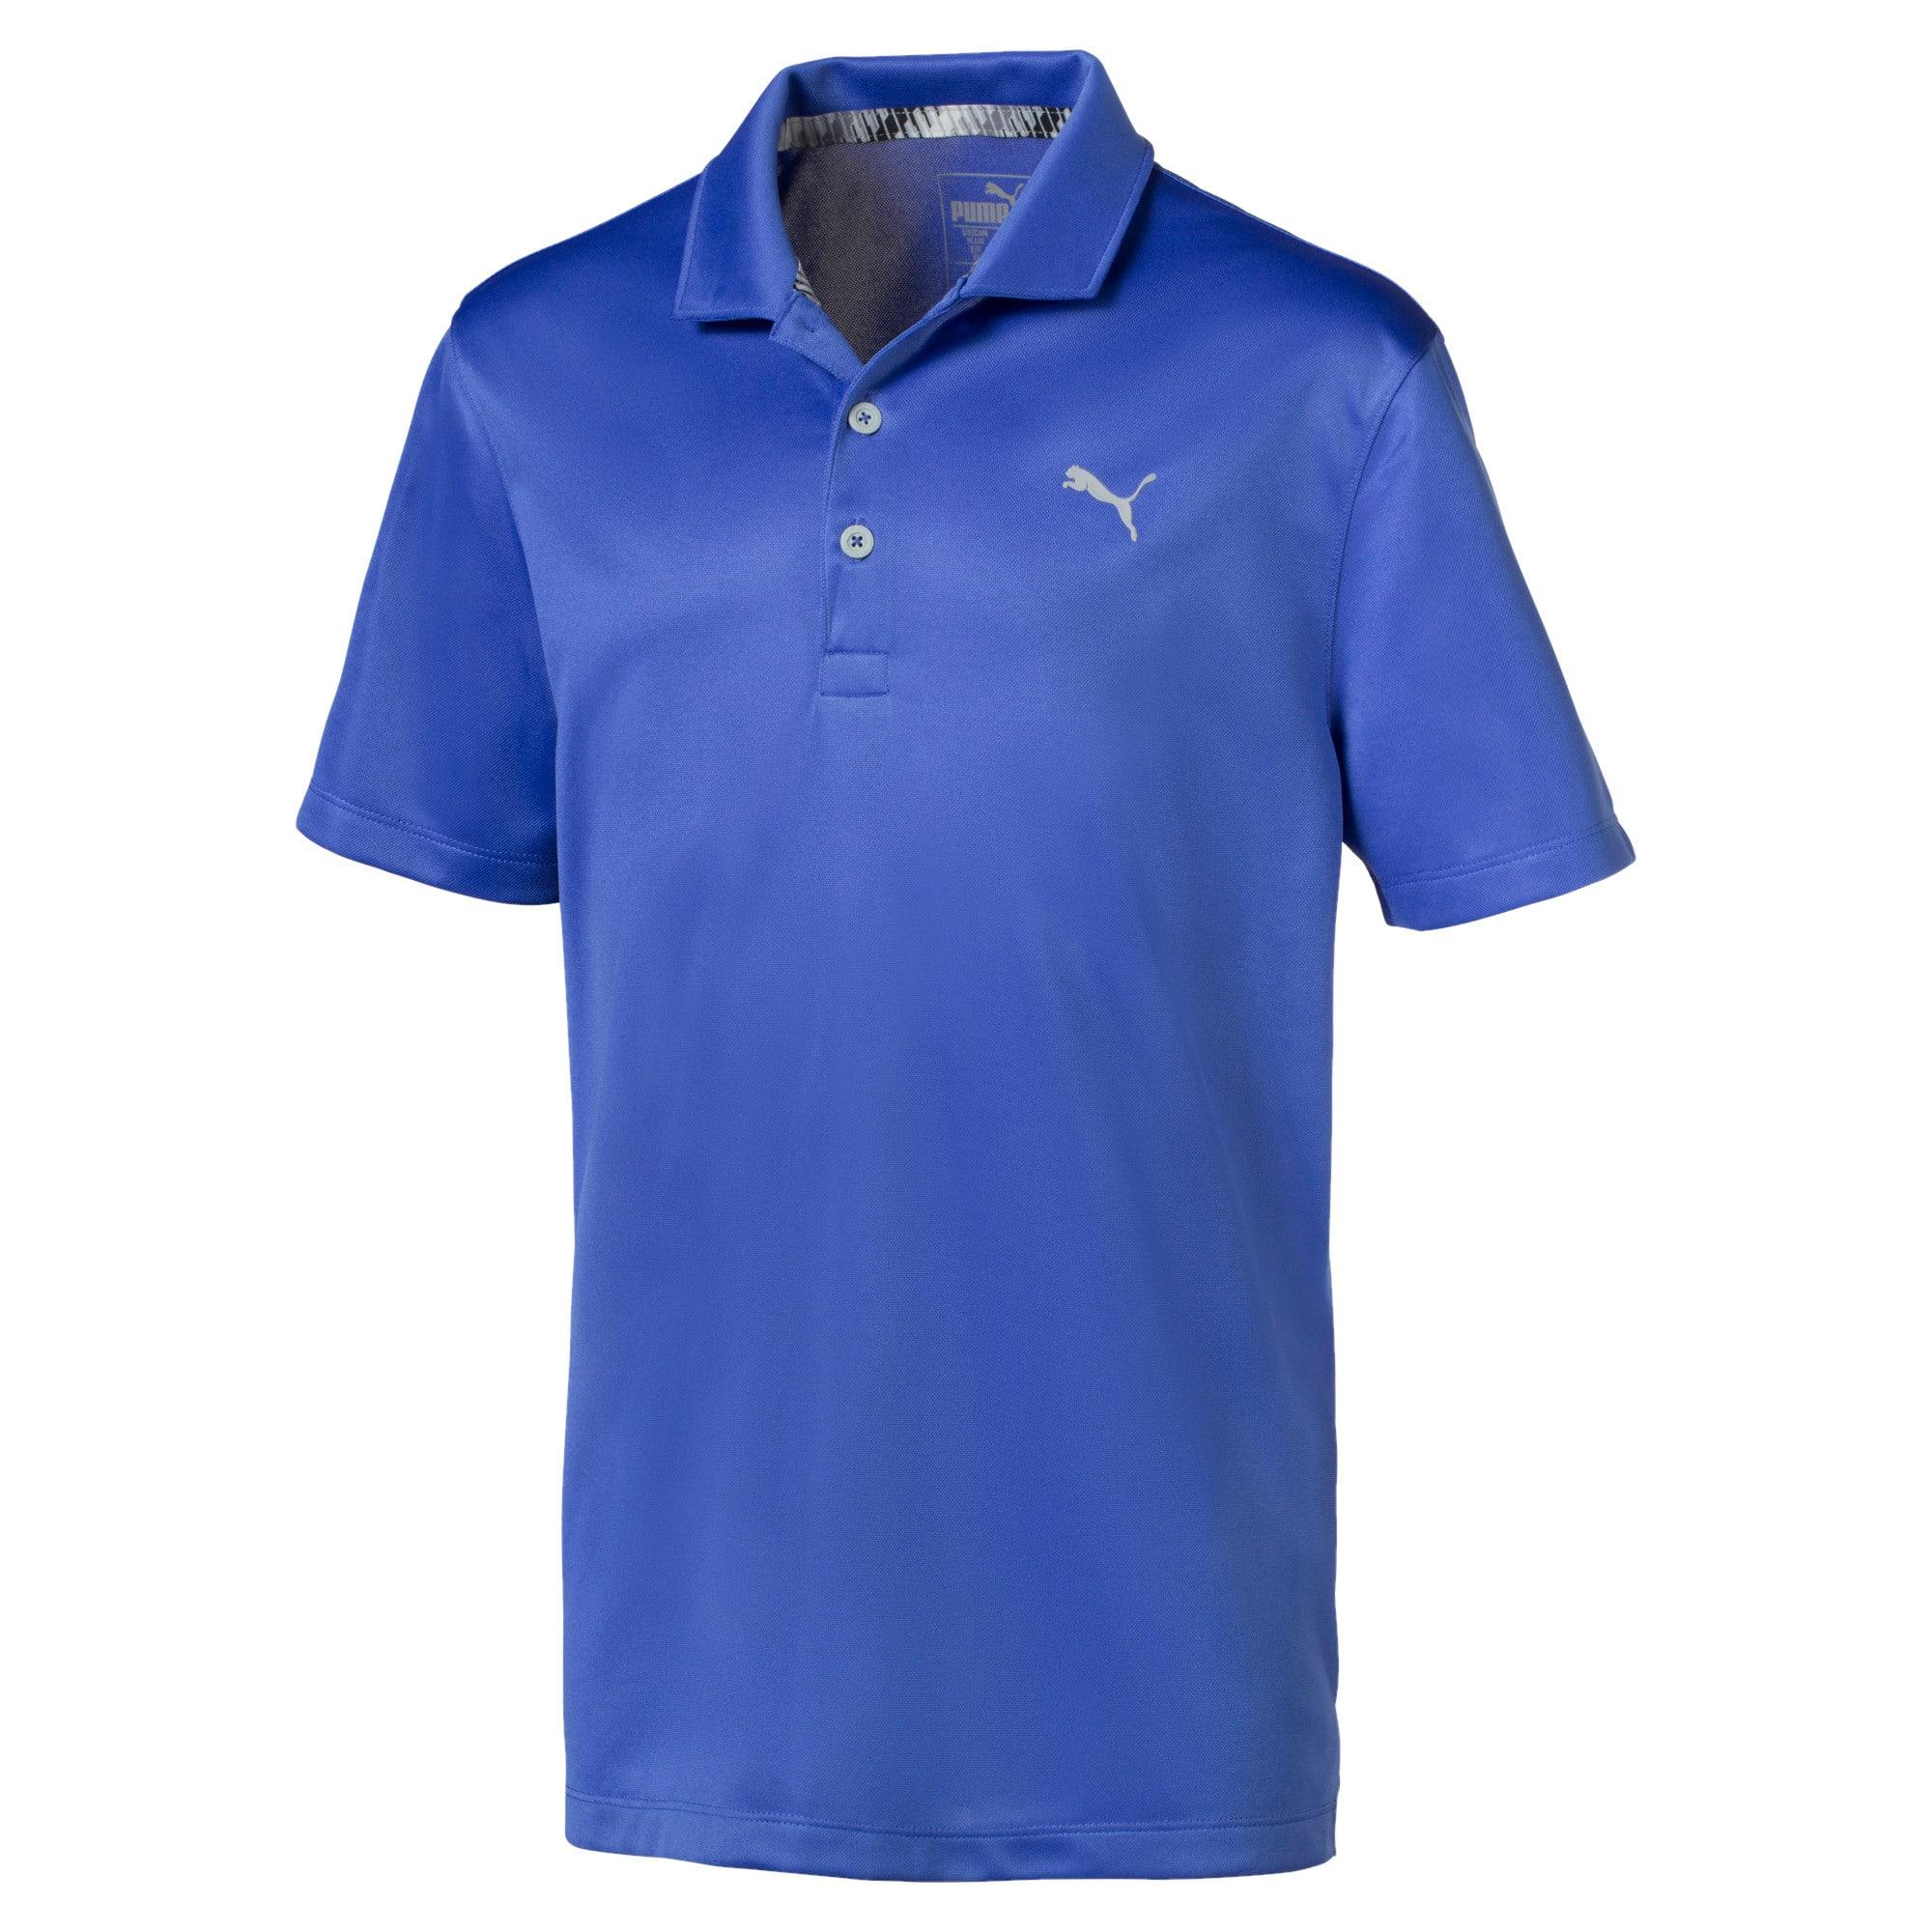 Thumbnail 1 of Essential Boys' Golf Polo, Dazzling Blue, medium